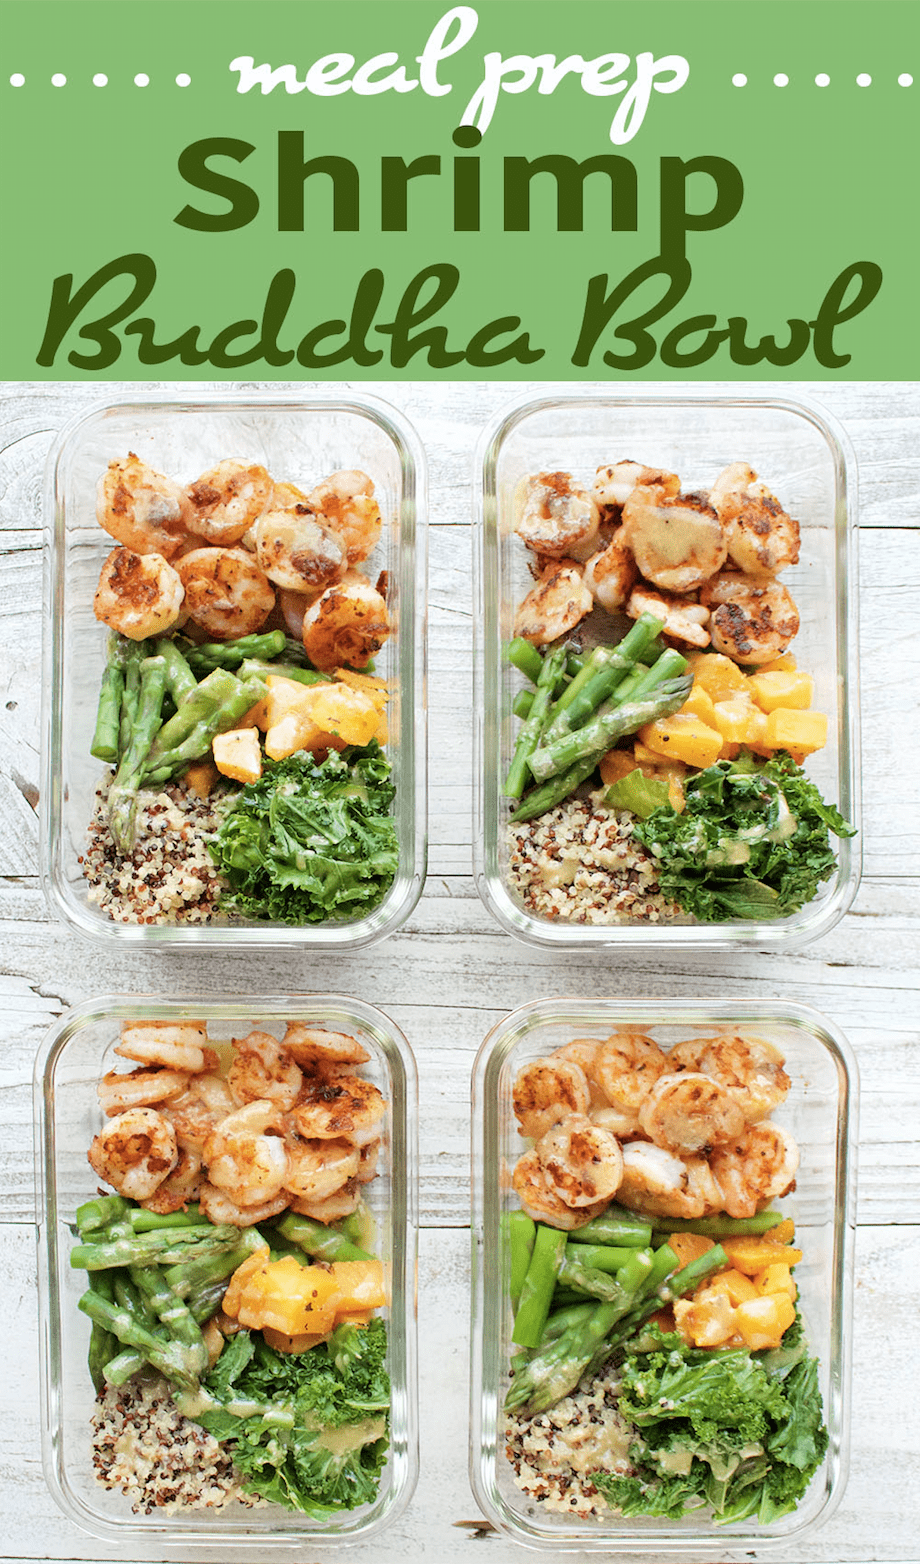 Shrimp Buddha Bowl Recipe Peanut Butter And Fitness Meal Prep